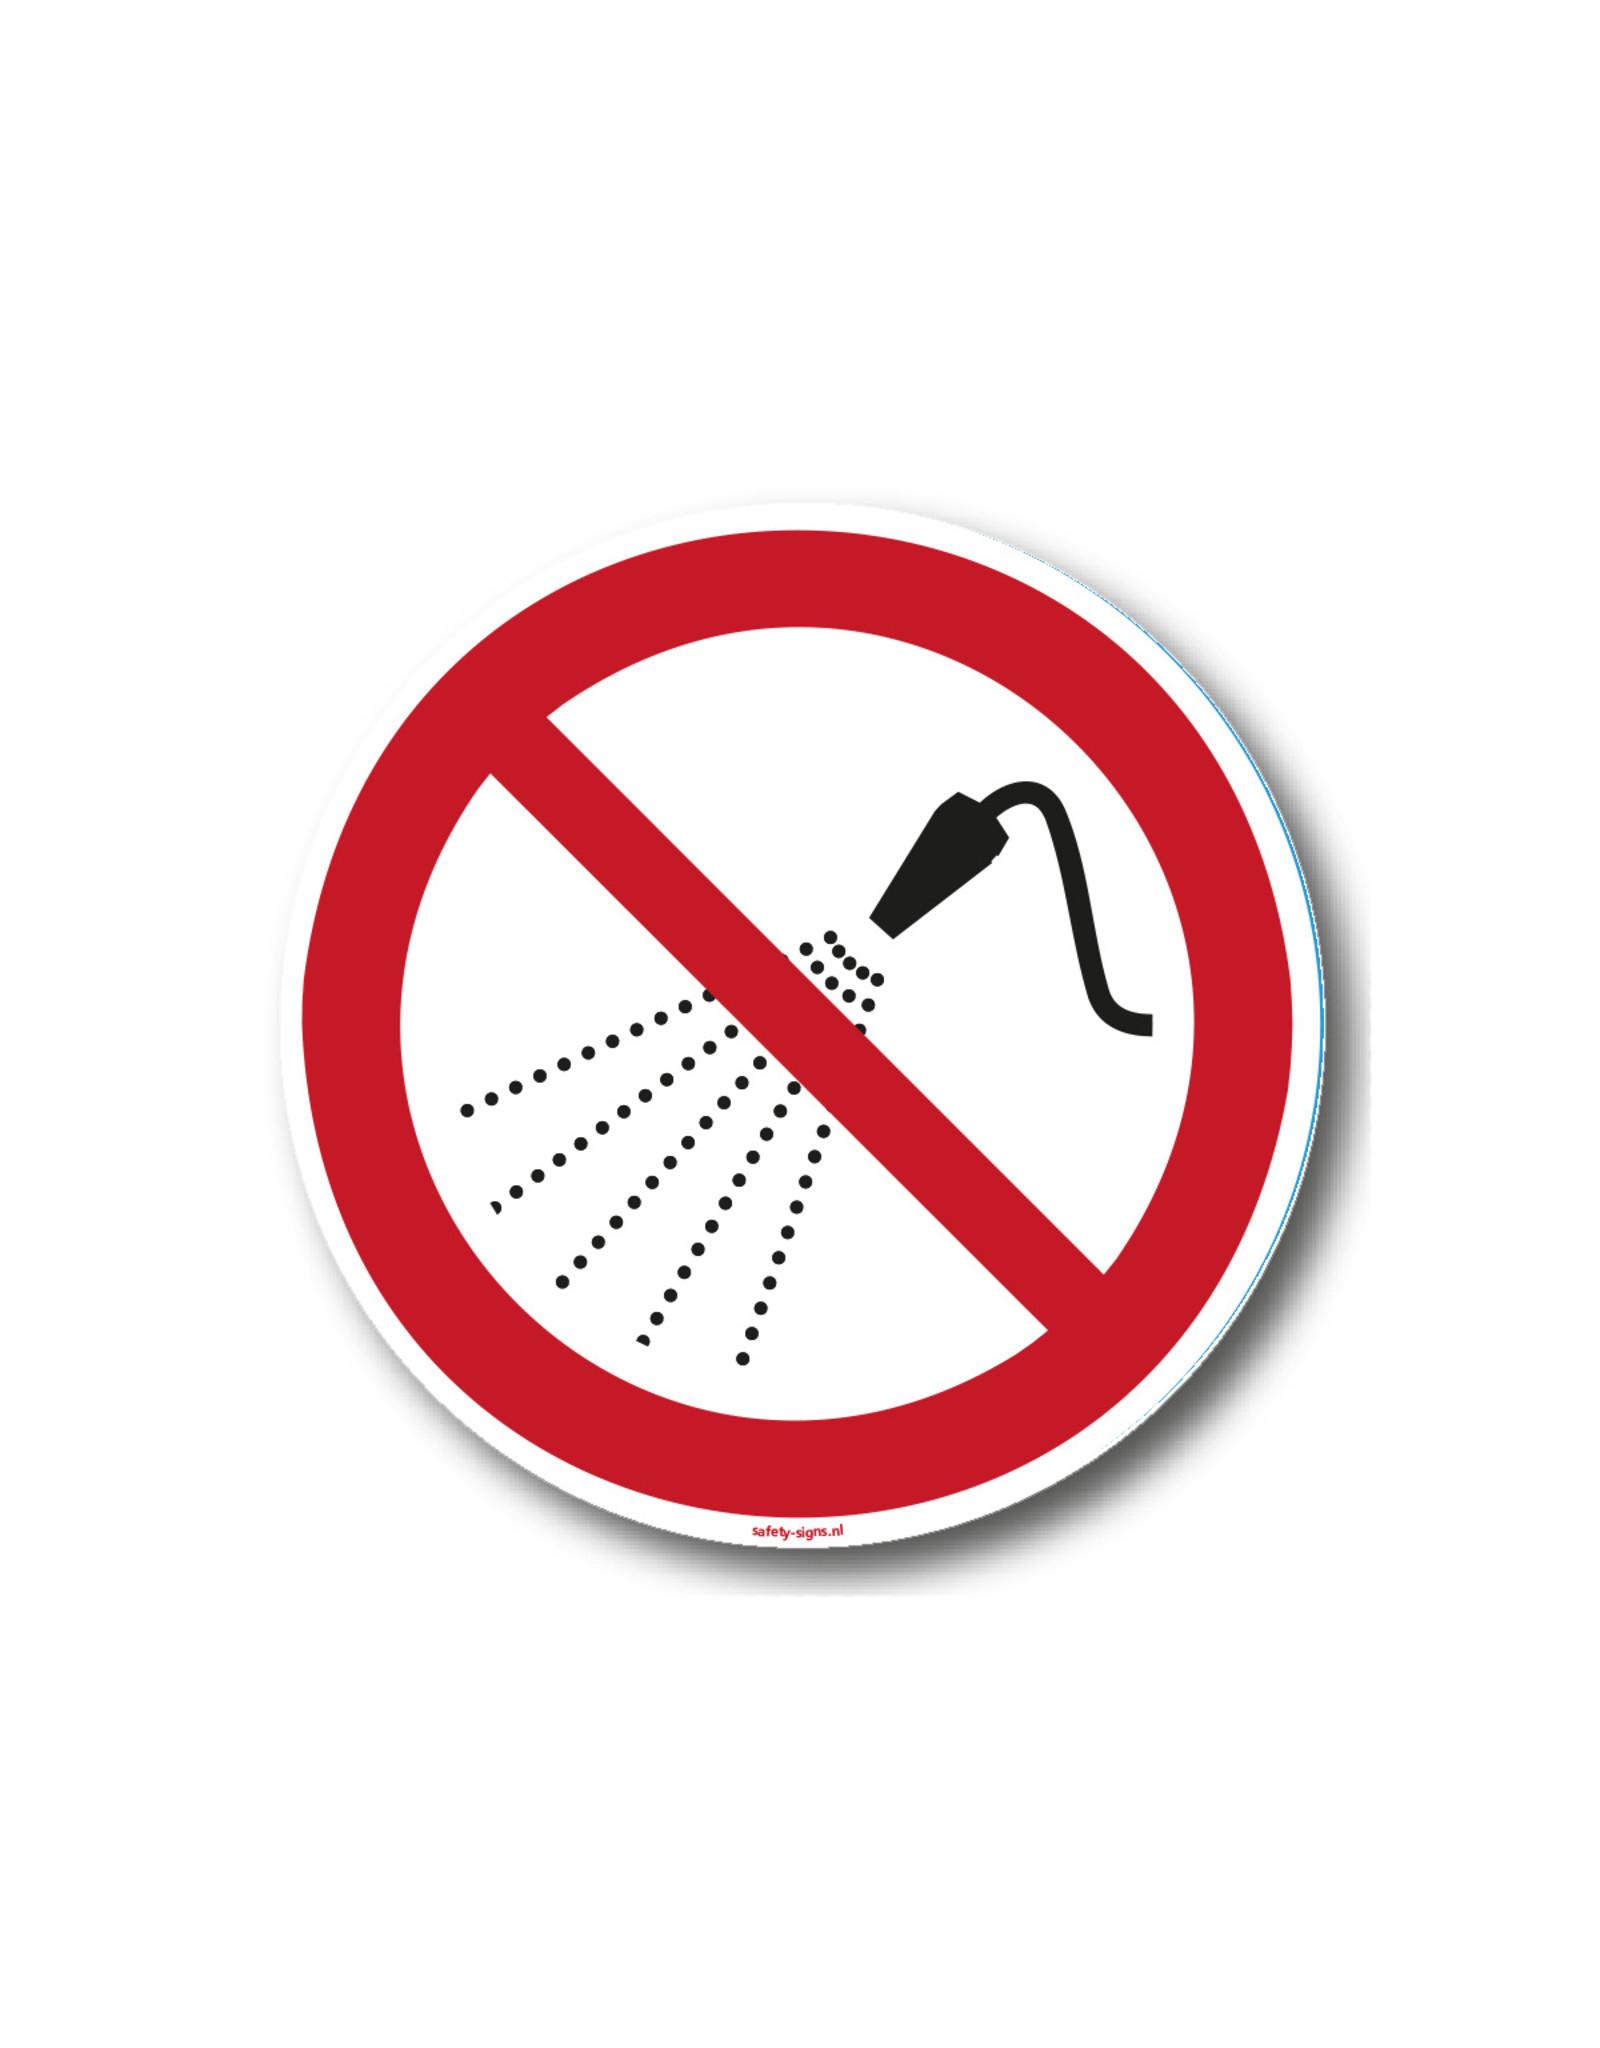 safety-signs.nl Pictogram - P016 - Verboden te besproeien met water - ISO 7010